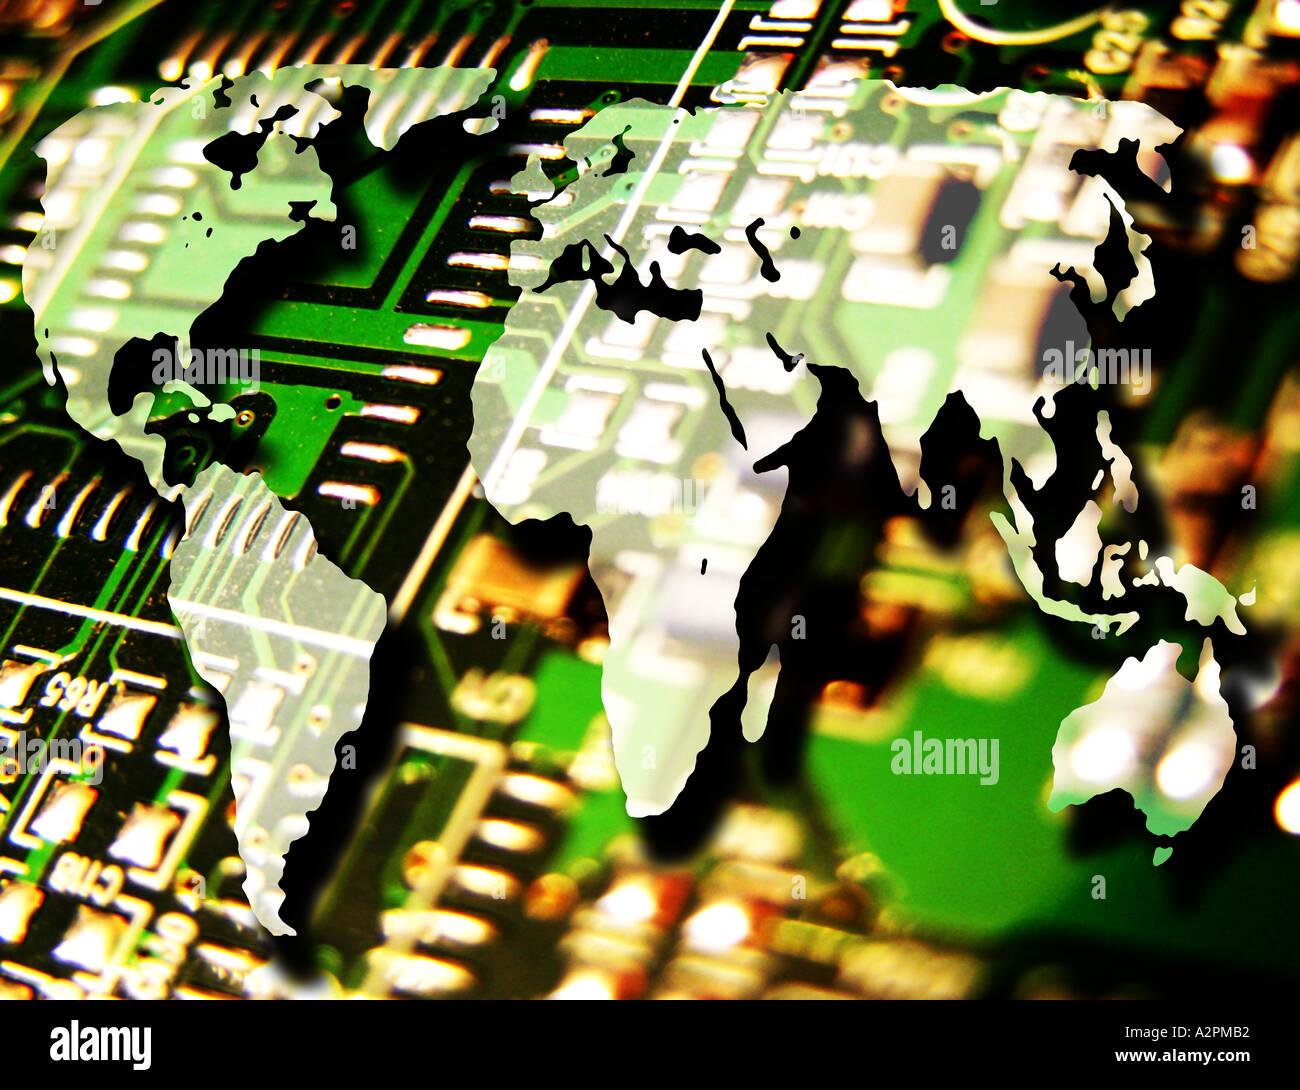 Global Technology - Stock Image